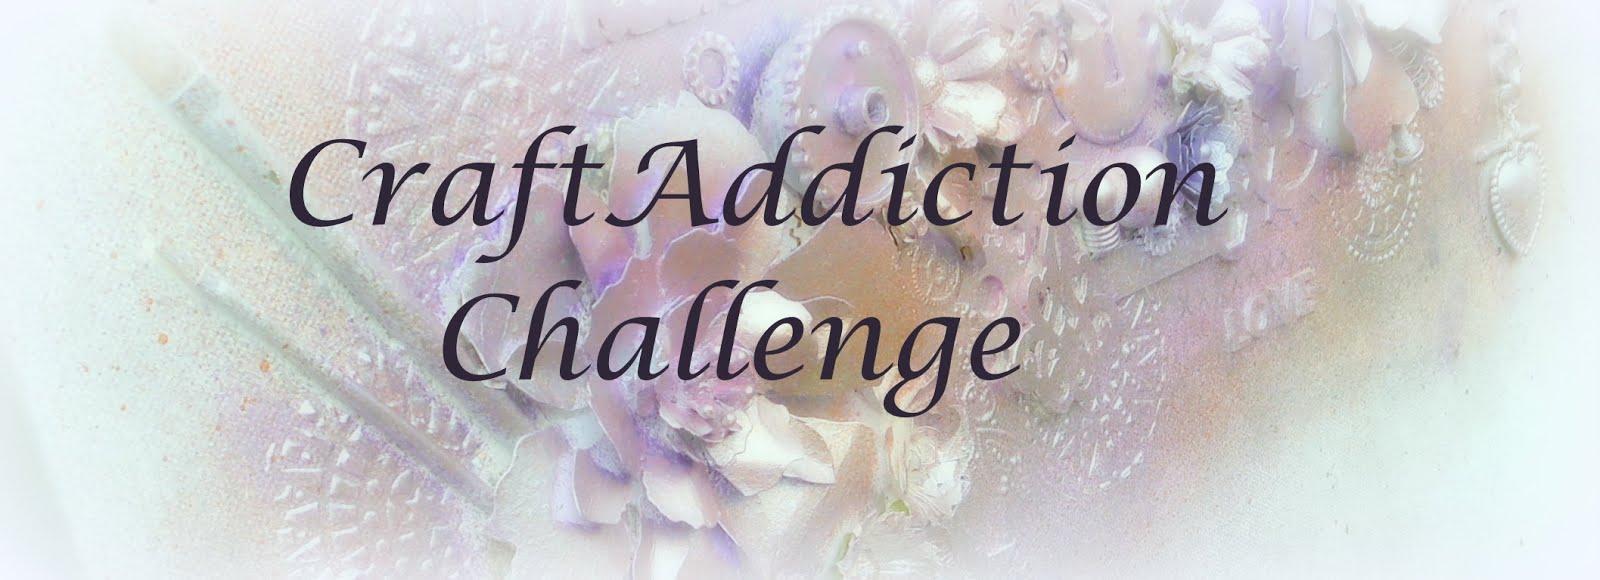 Craft Addiction Challenge